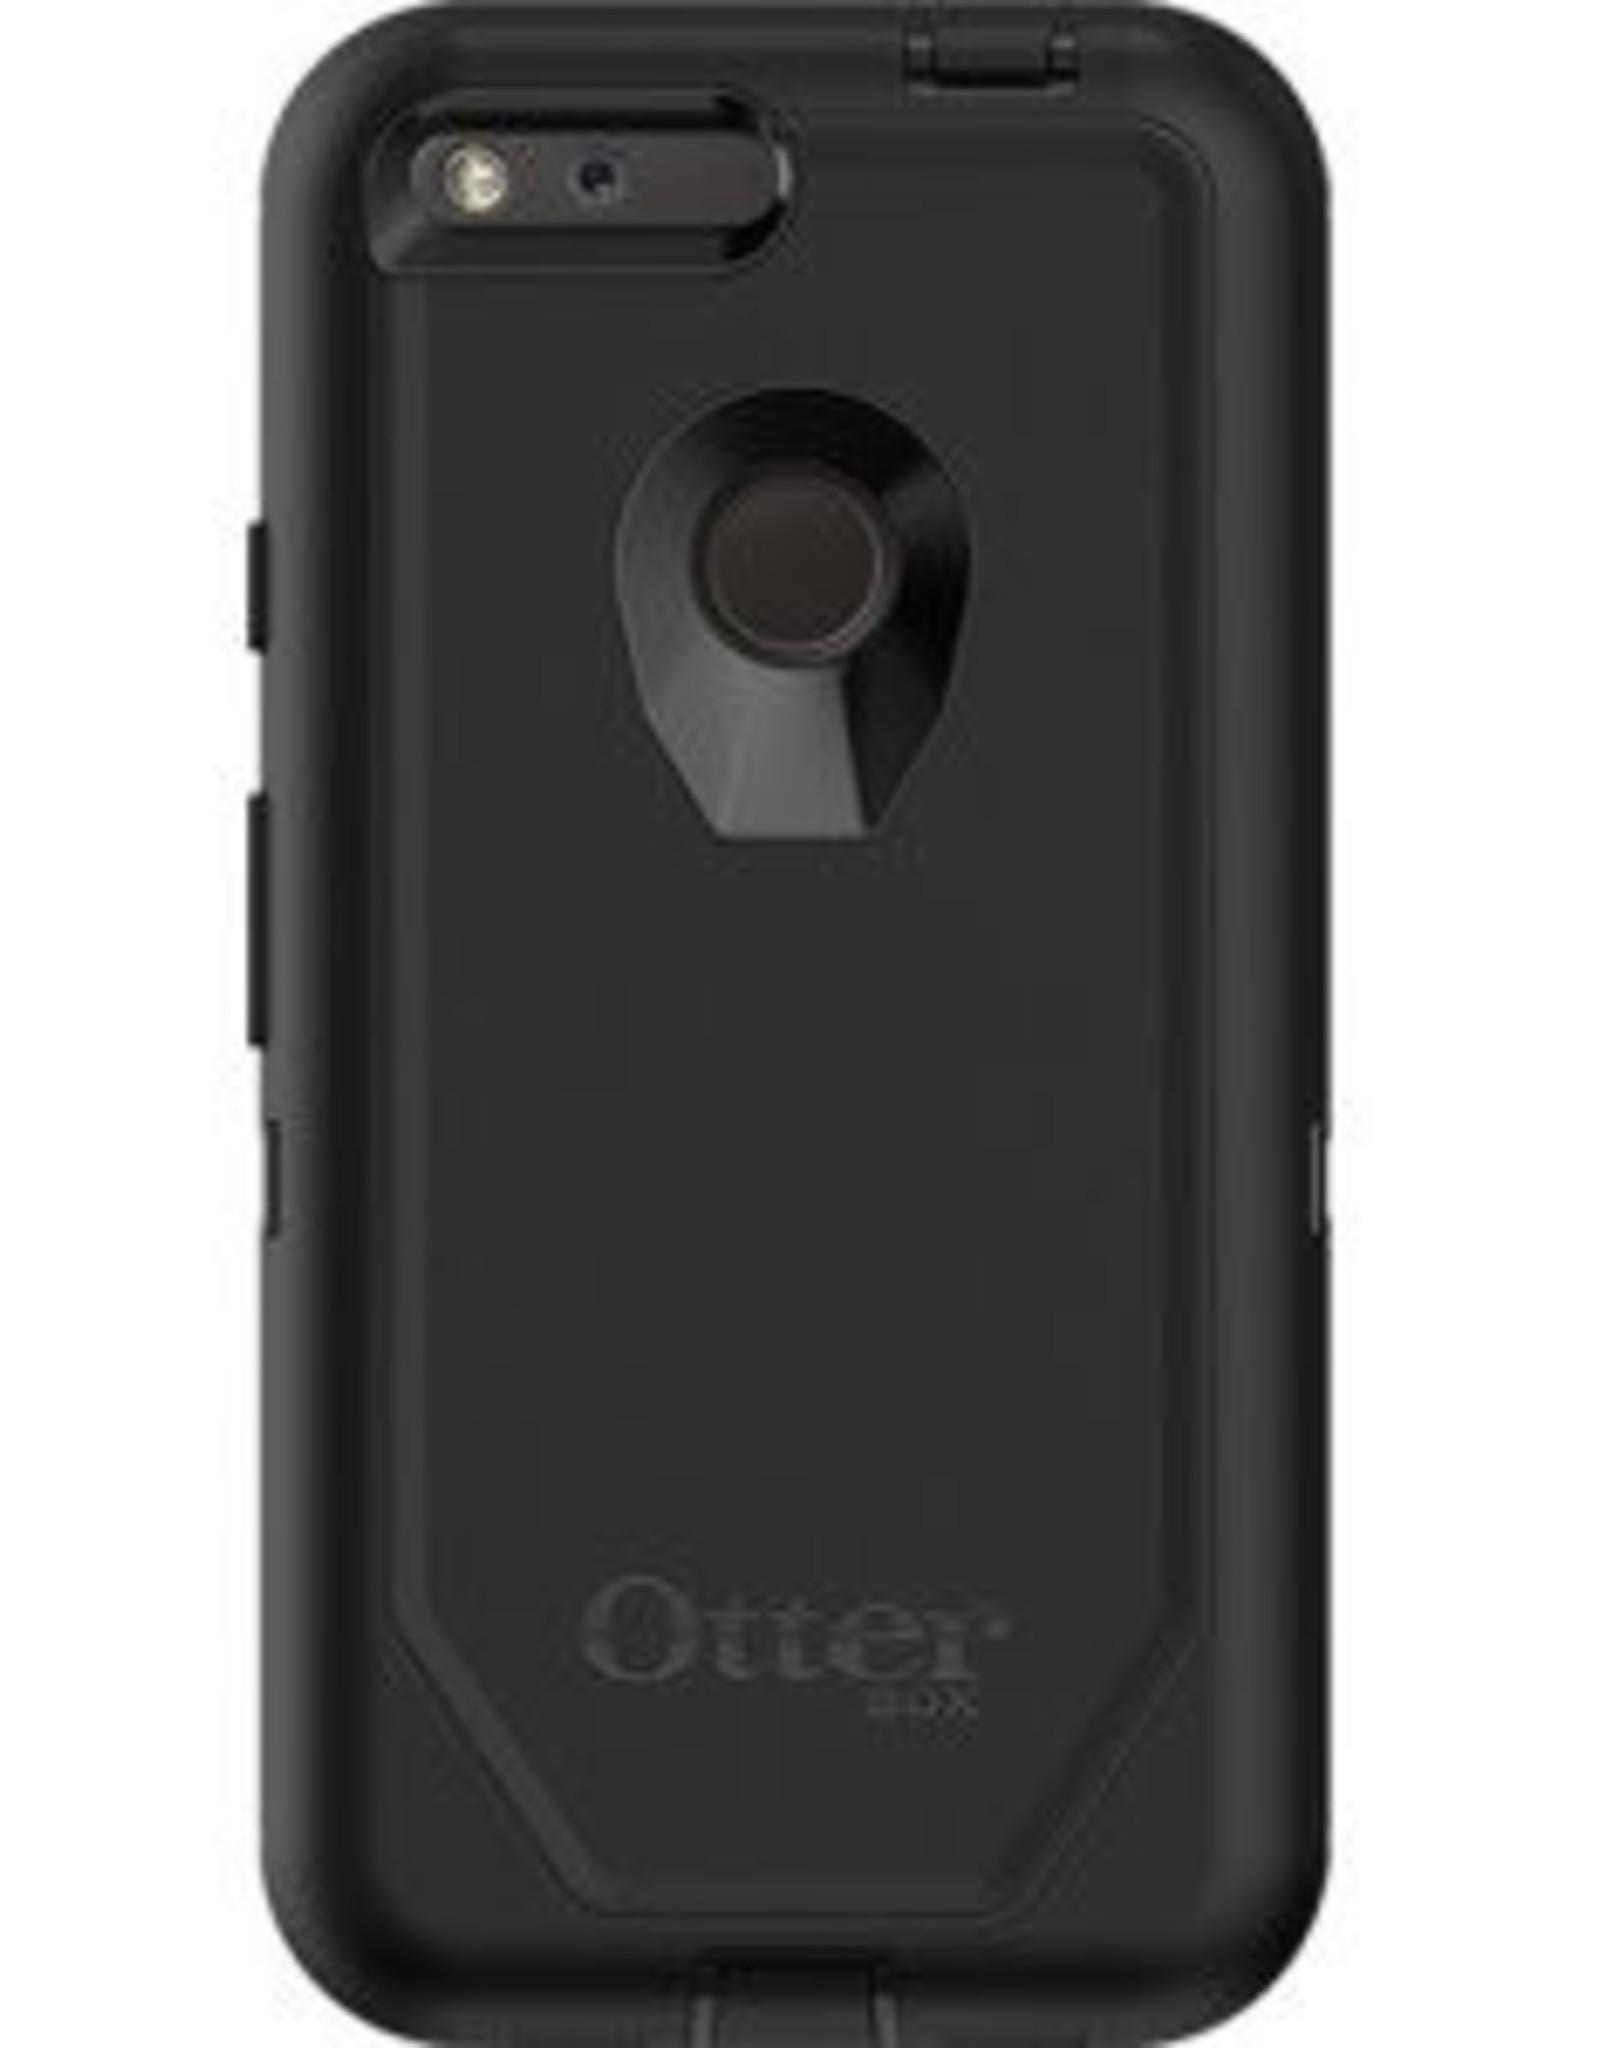 Otterbox OtterBox | Google Pixel XL Defender Black | 112-8847